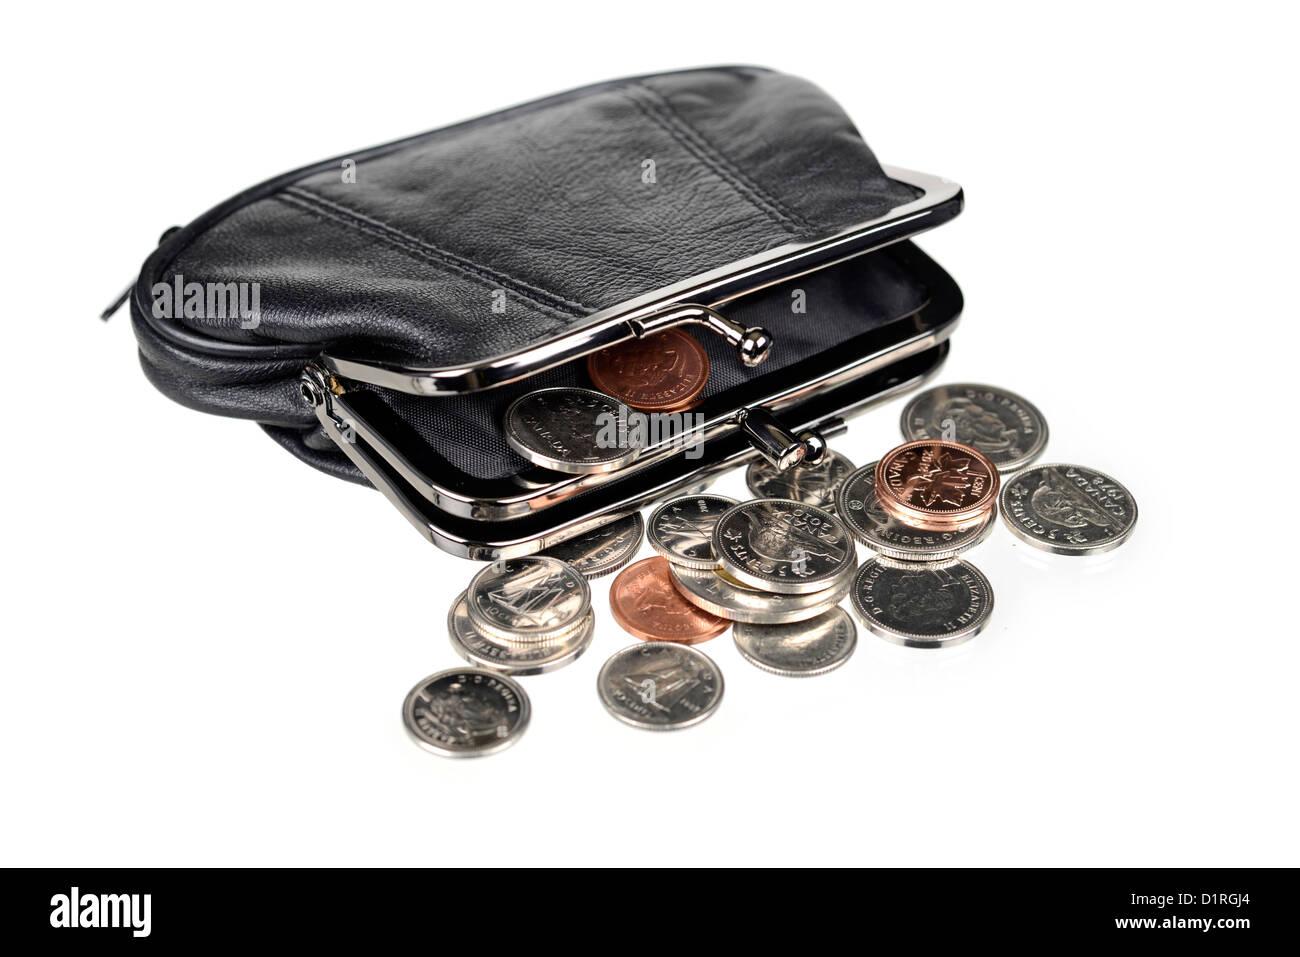 Geldbörse mit Münzen, Canadian Geld. Stockbild